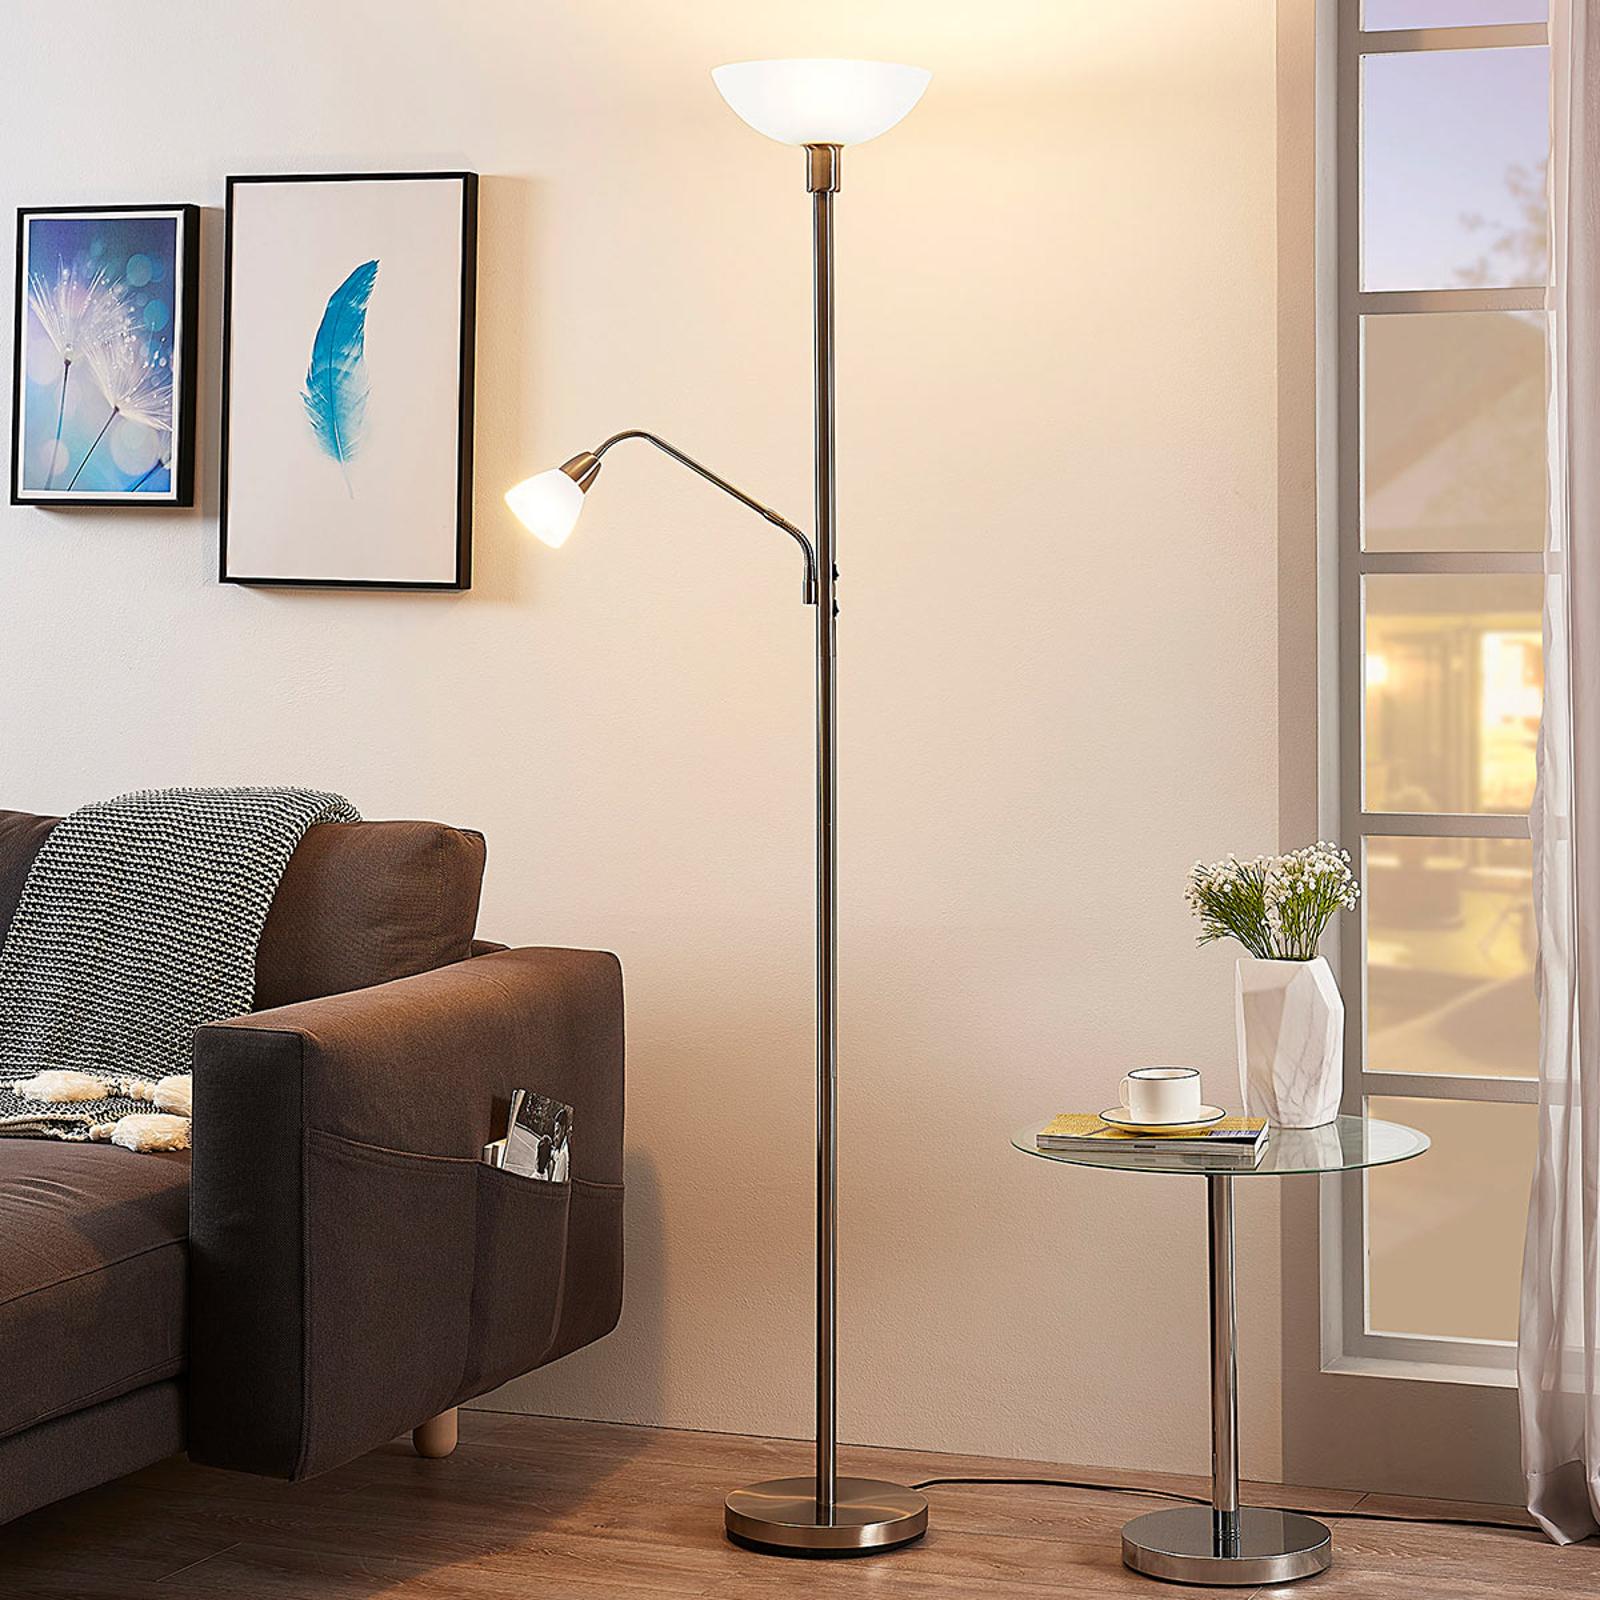 Nikkelkleurige LED uplighter Jost met leeslicht